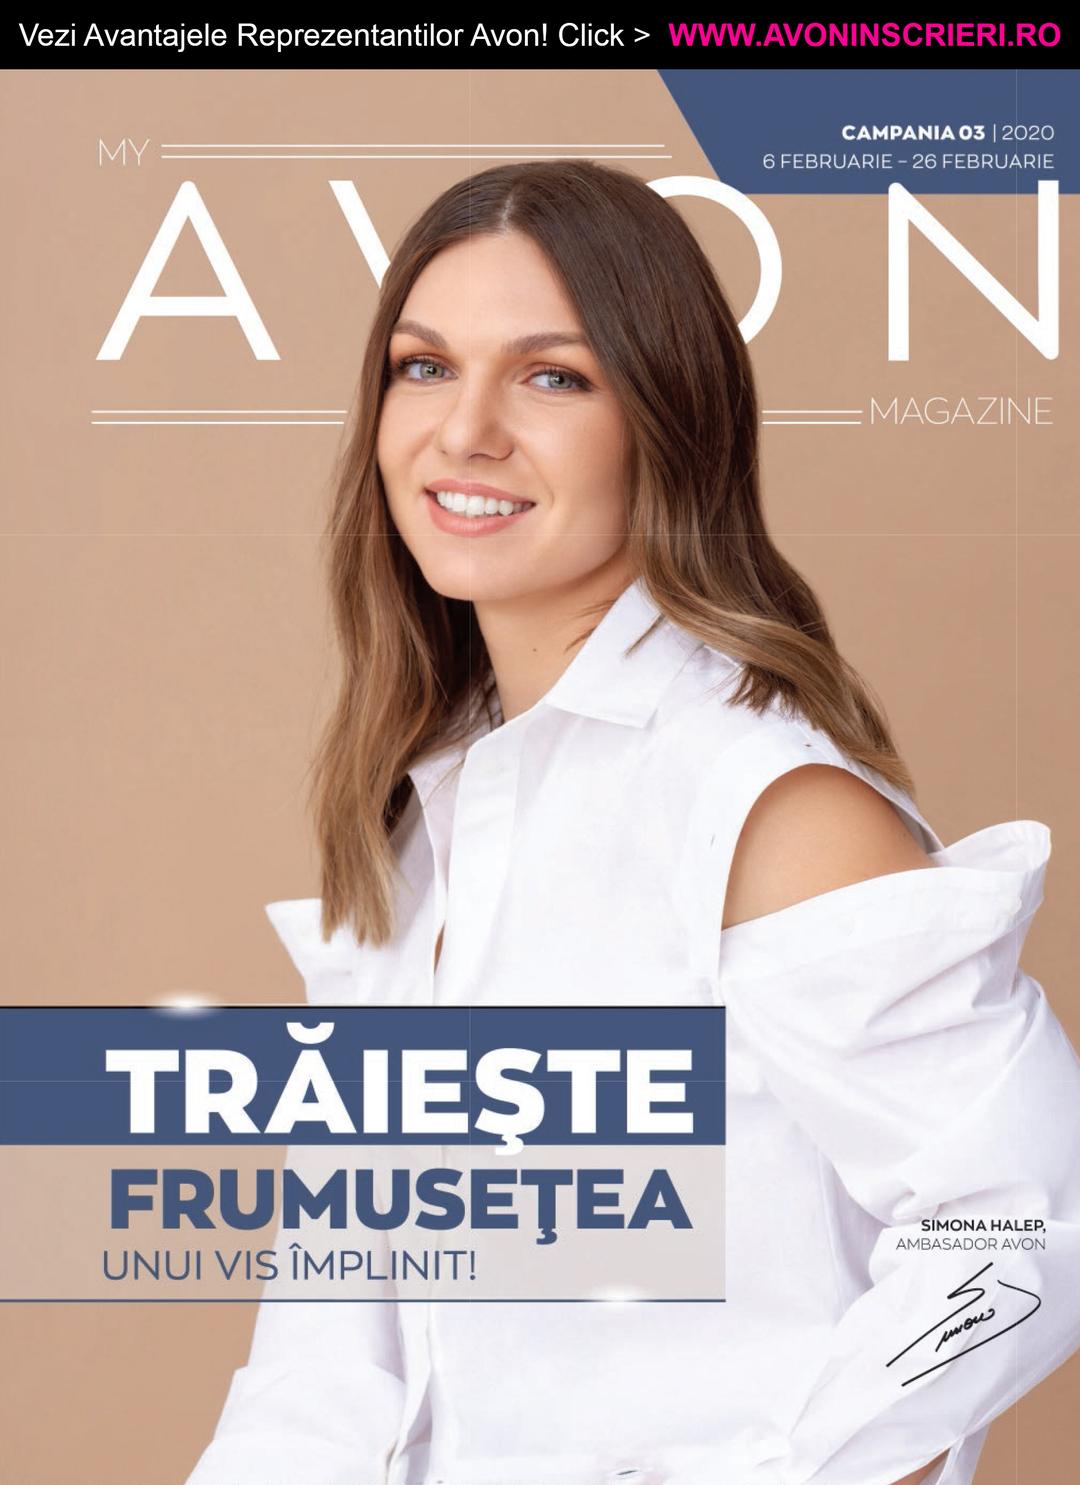 Page 1 of Revista My Avon Magazine C3 2020 - www.avoninscrieri.ro